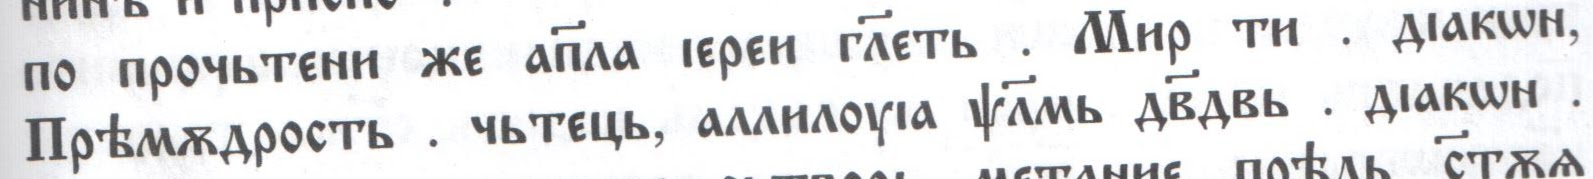 o.A.Pankrarov_edinoverie_ustav_comments-10